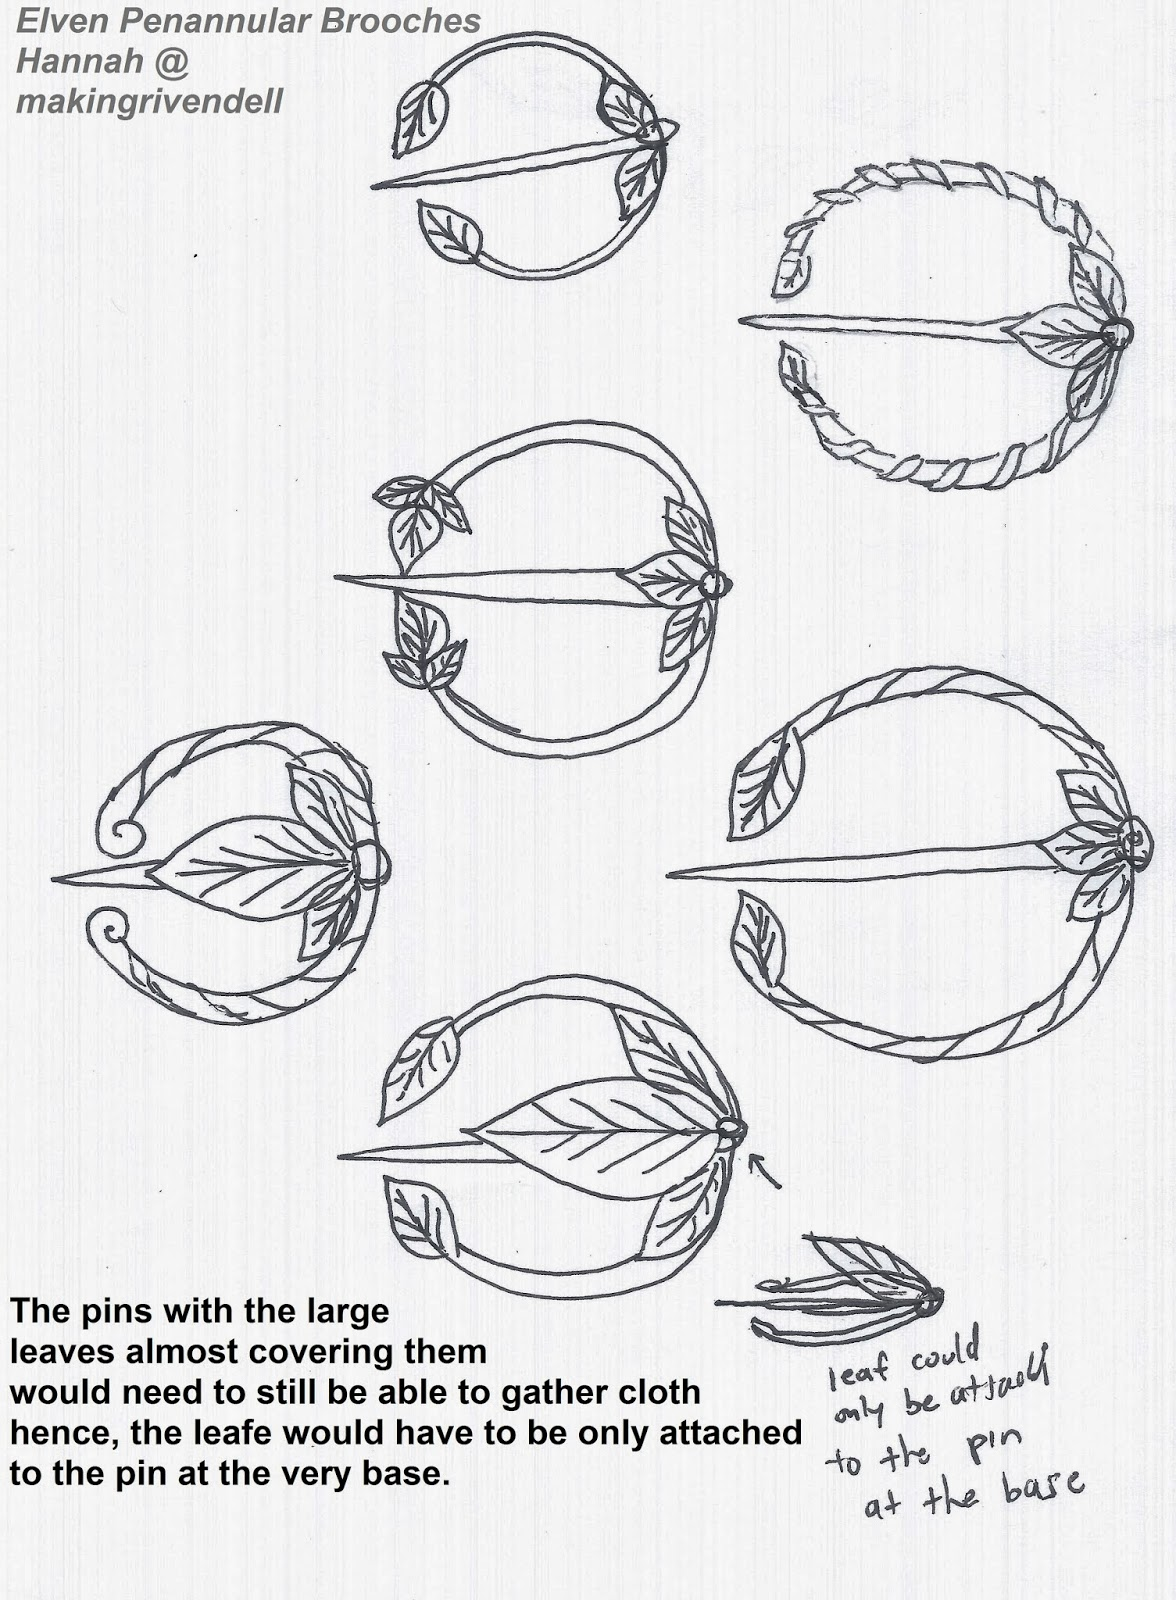 Elven penannular brooches designs